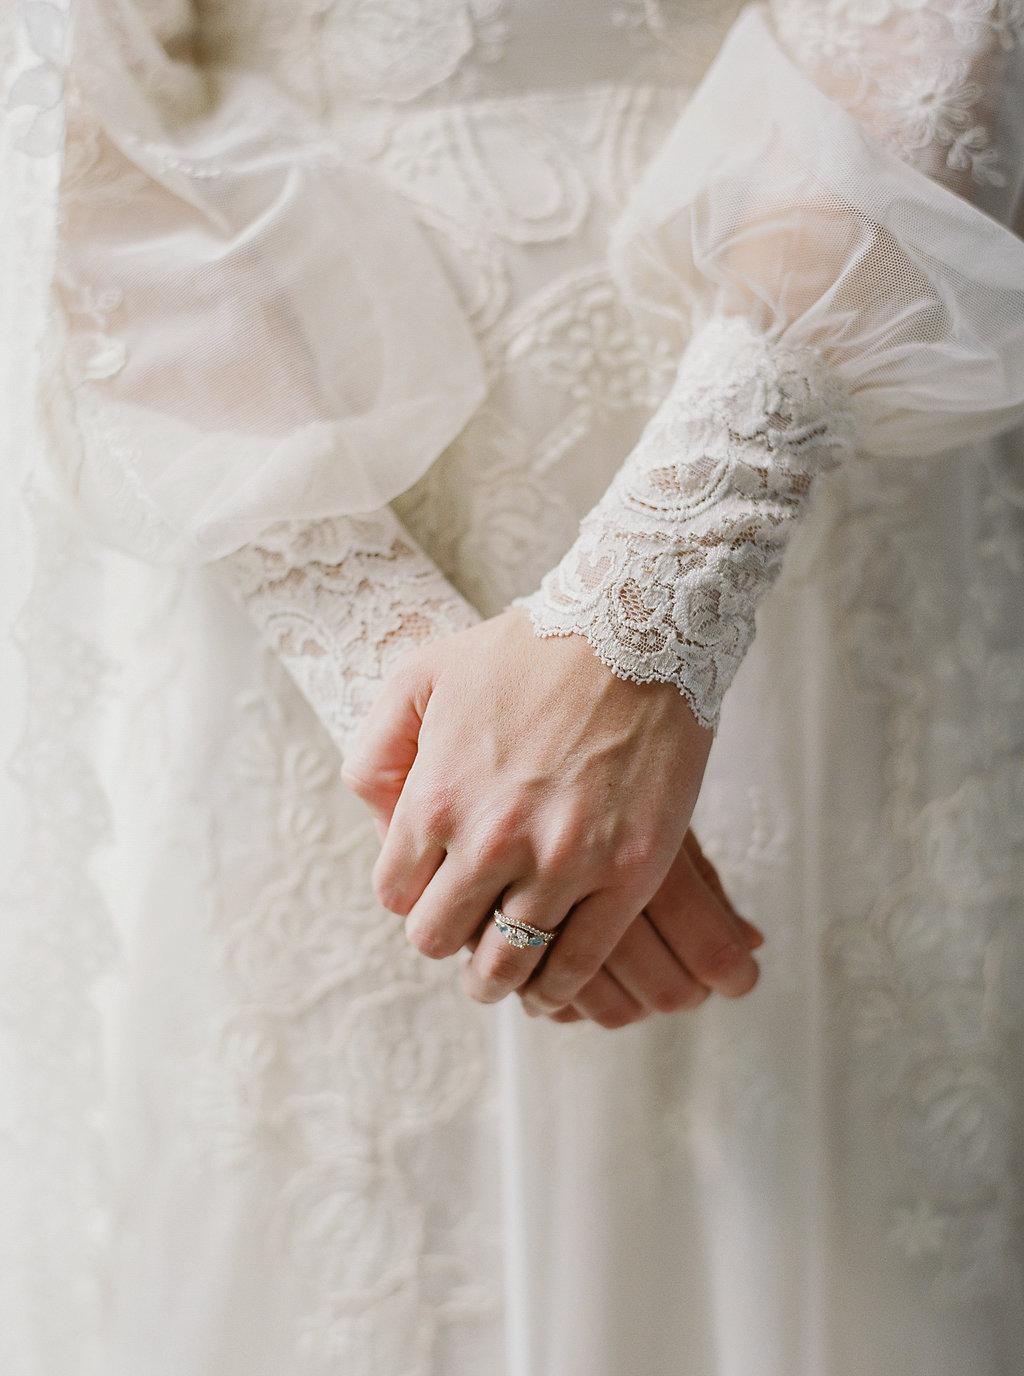 fall-wedding-Jenny-haas-Samantha-joy-events-laurel-court-cincinnati-wedding-dress